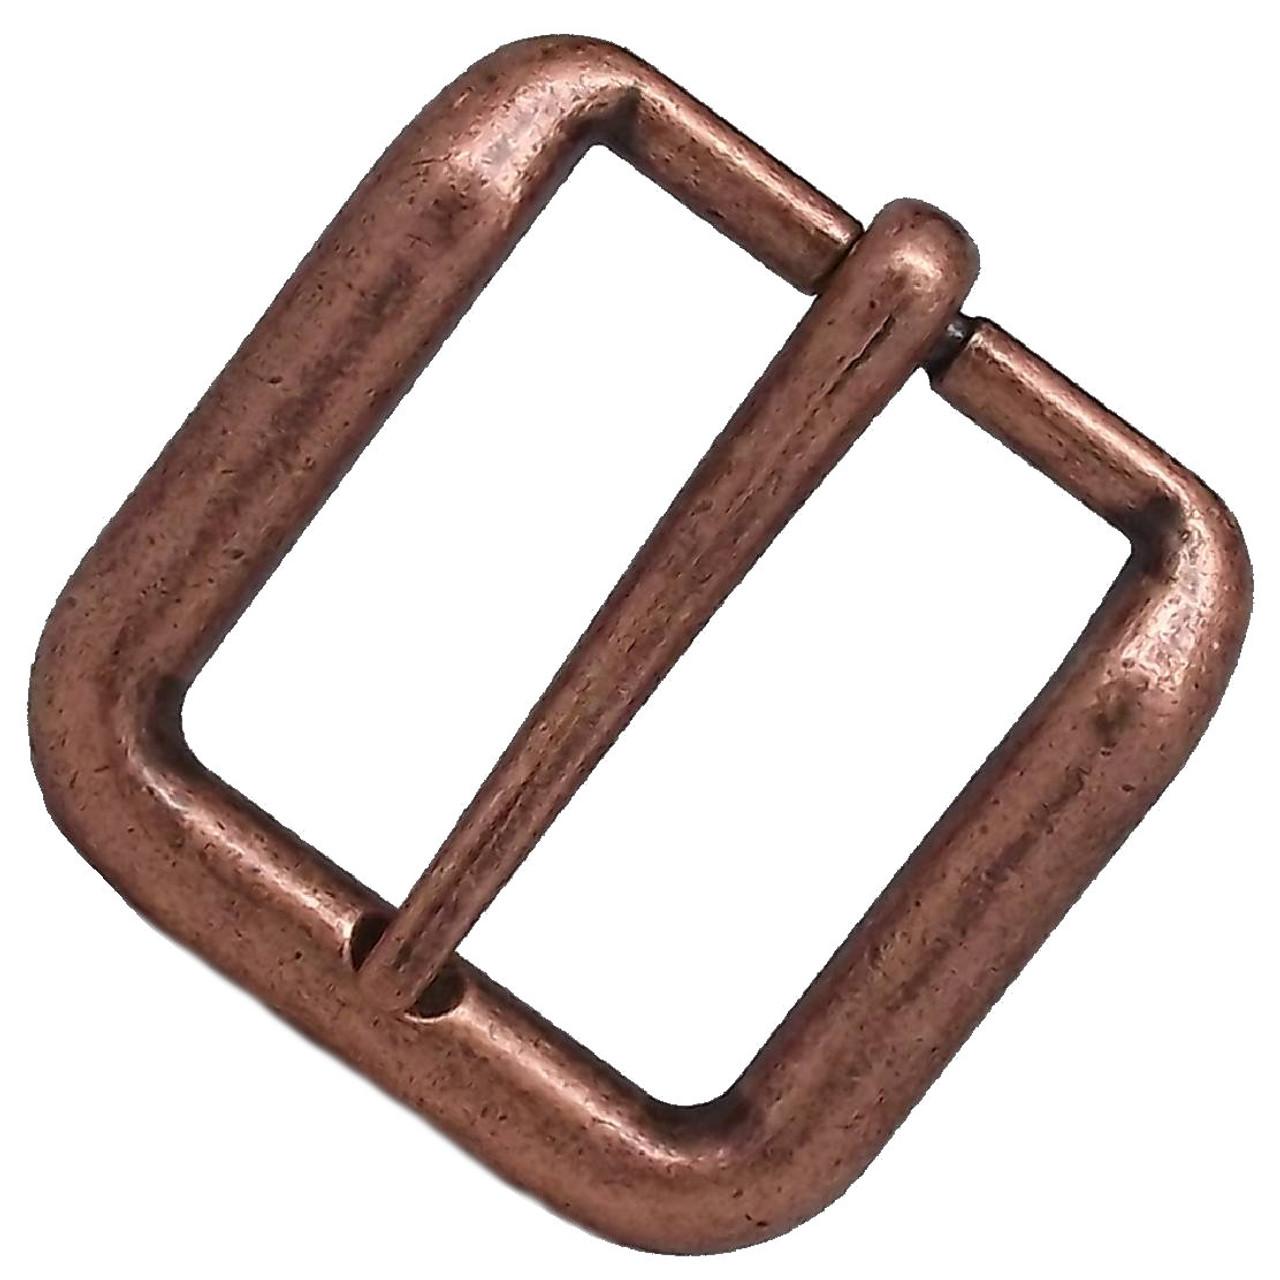 Solid Wave Belt Buckle Antique Copper